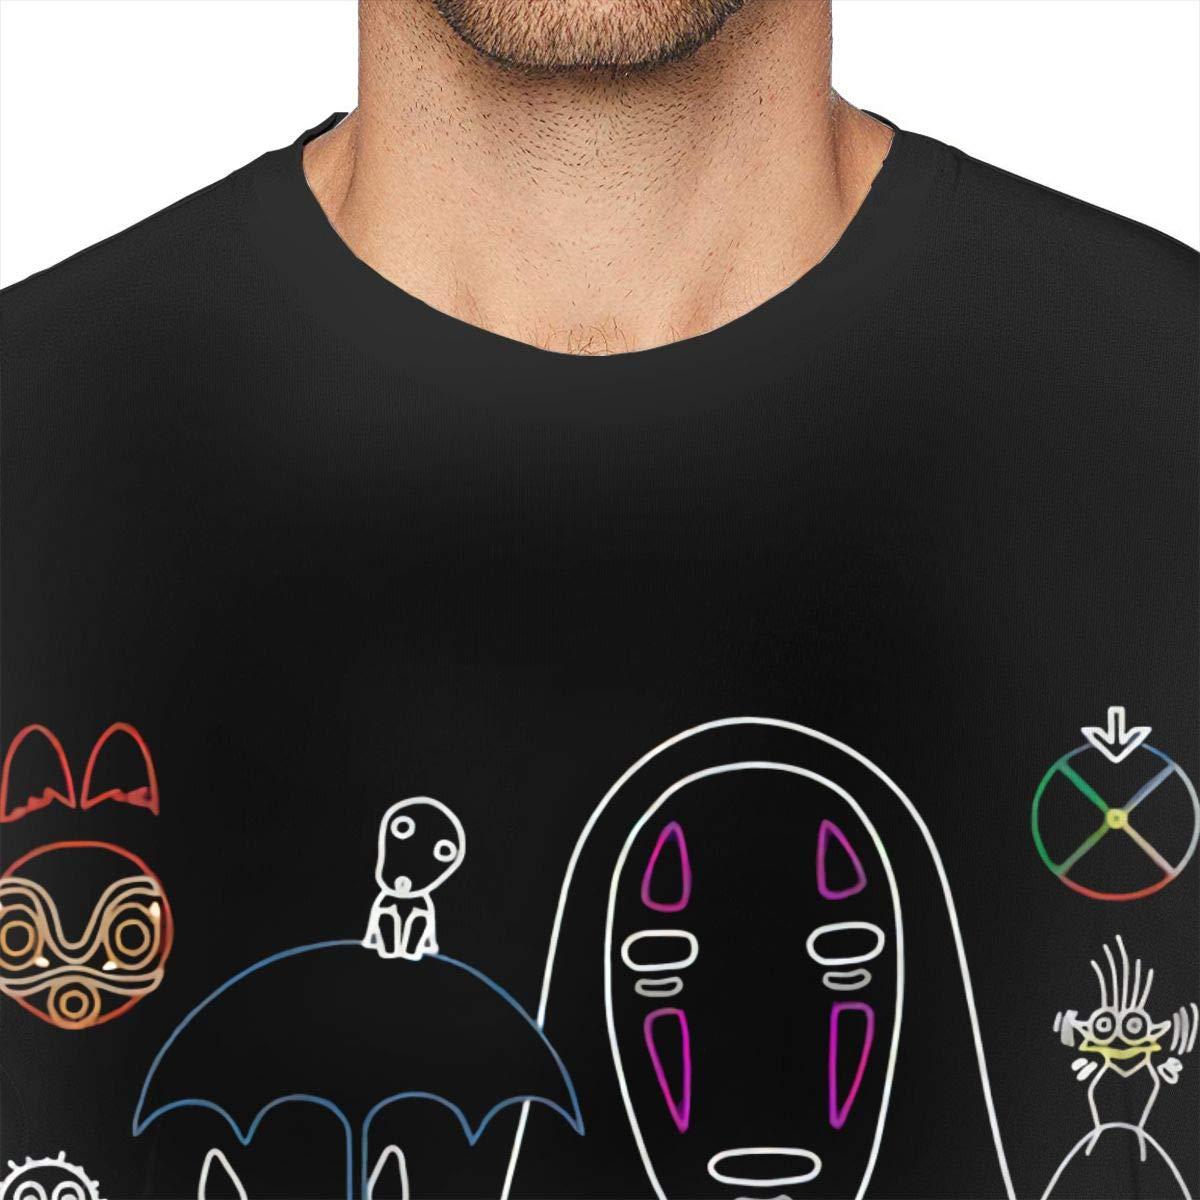 NeedLove Mens Cool Ghibli Mix V T-Shirt Black